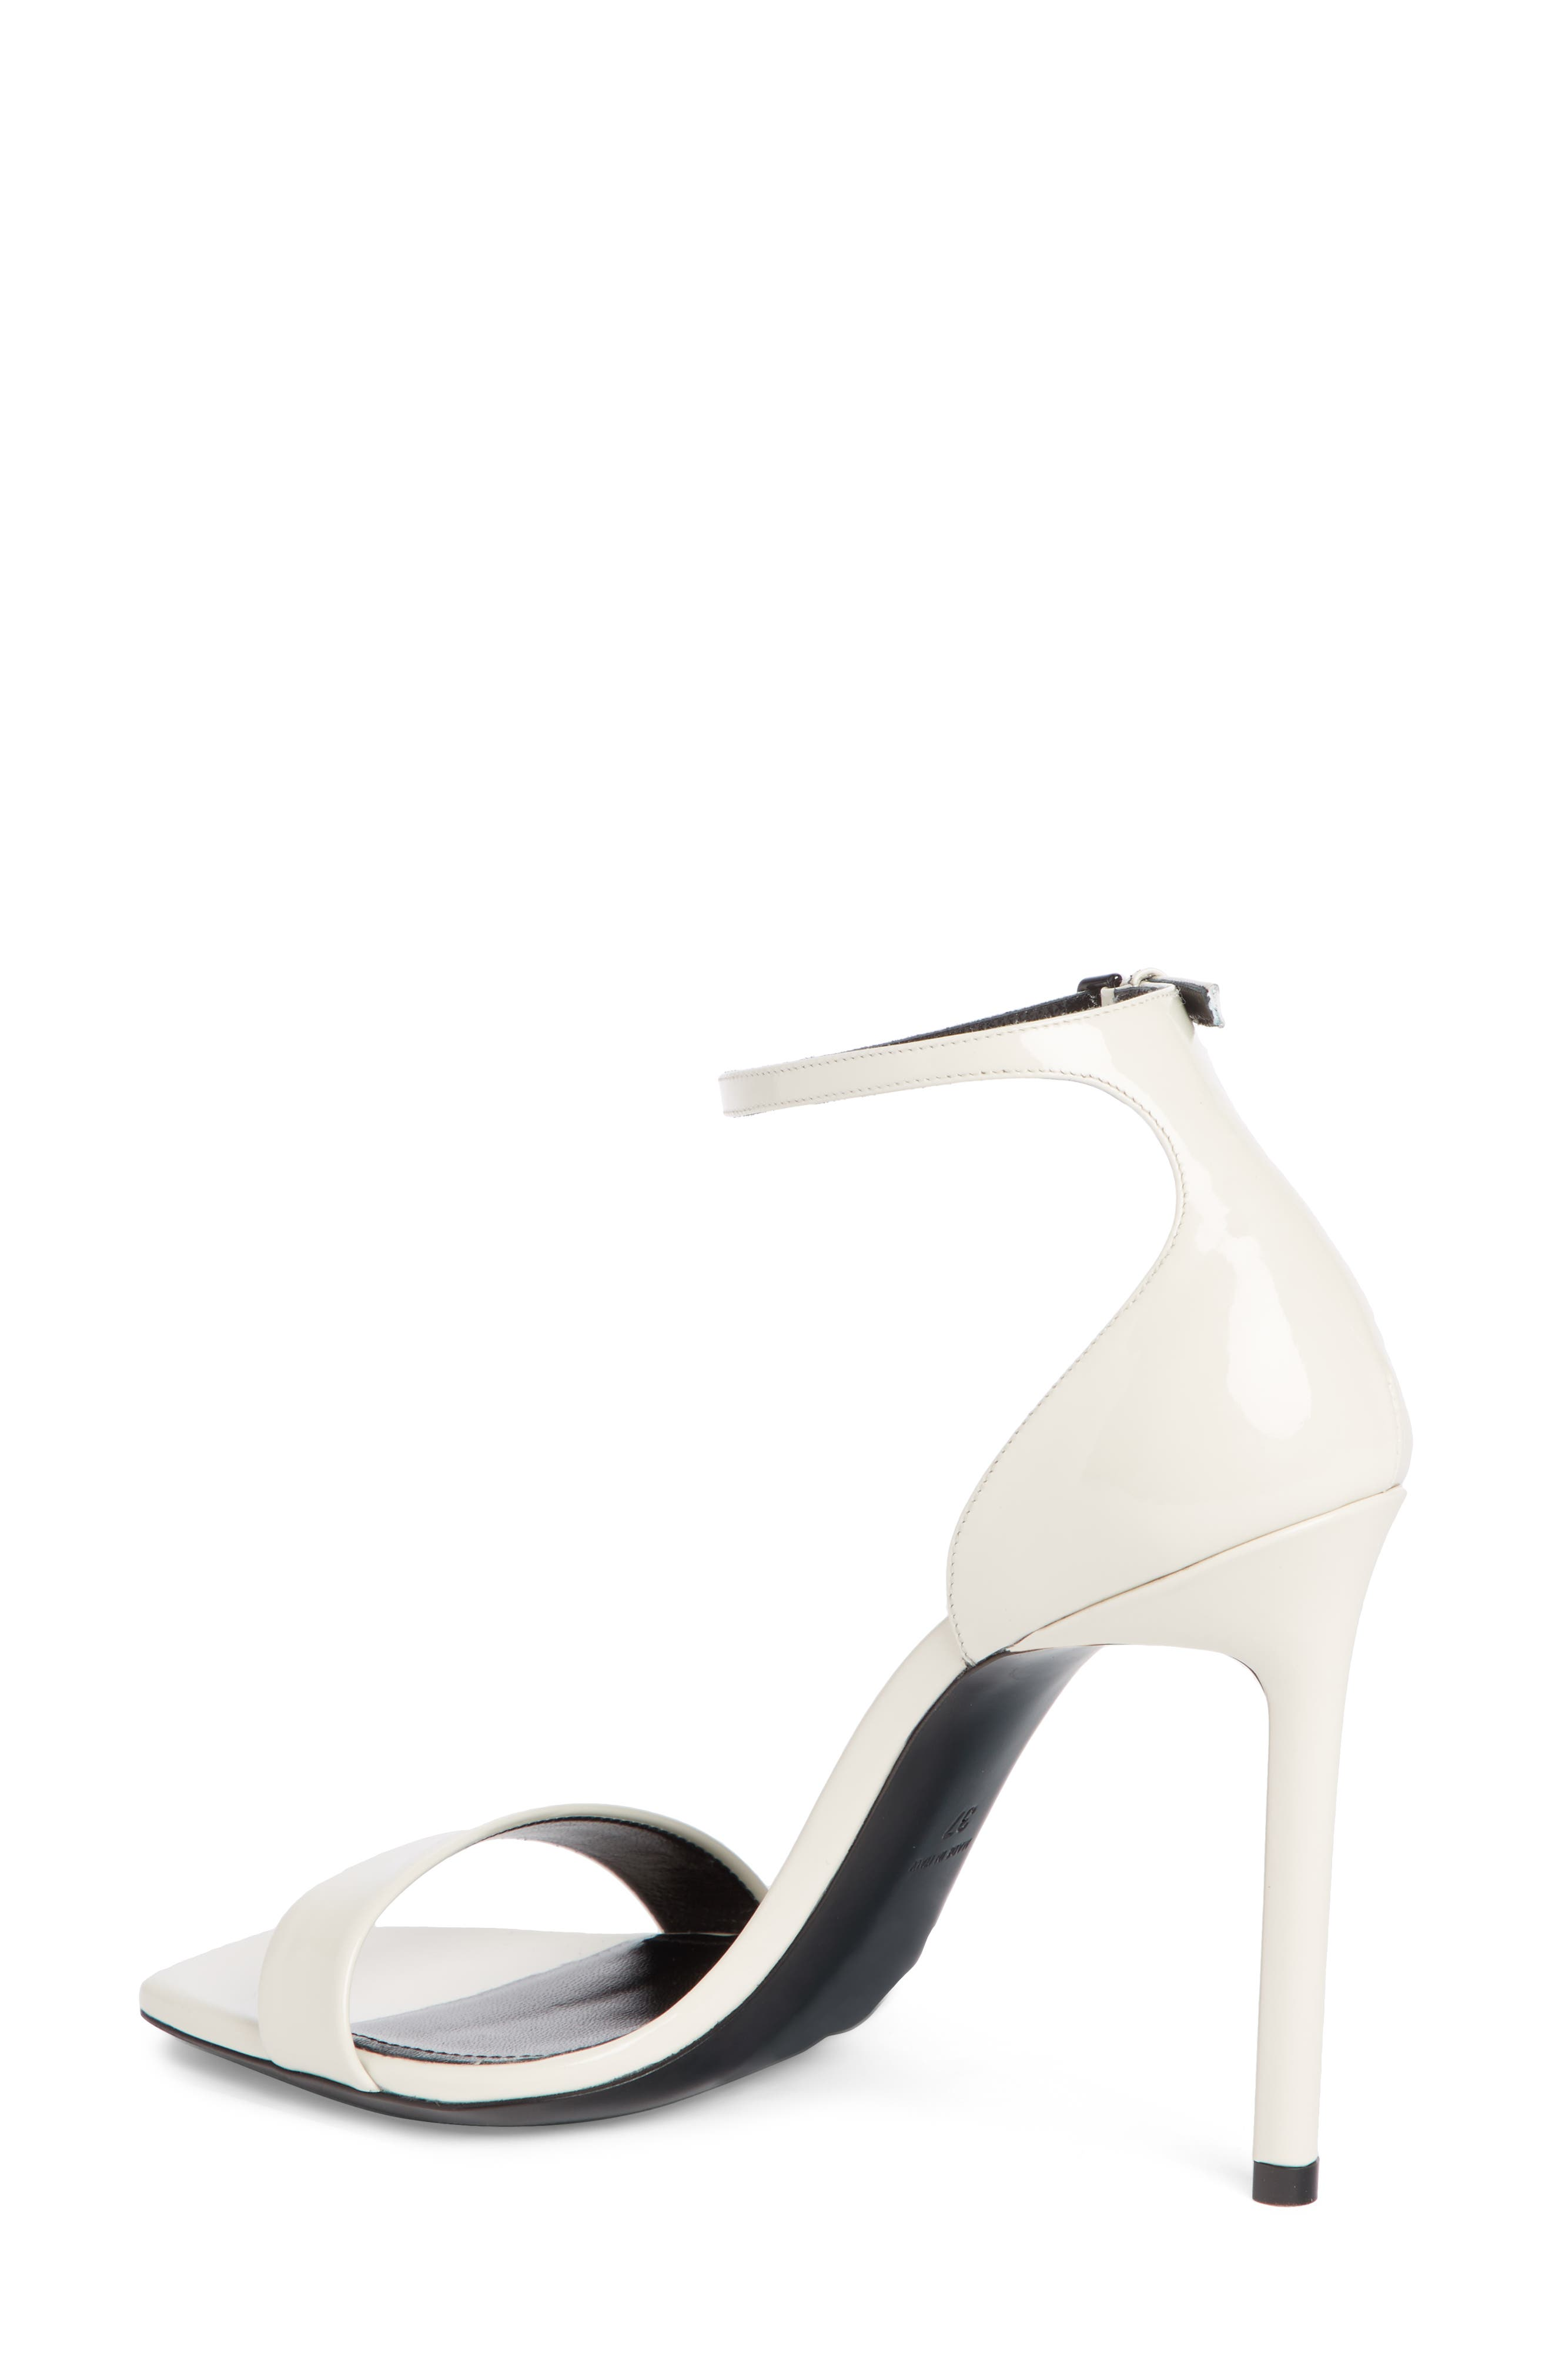 Amber Ankle Strap Sandal,                             Alternate thumbnail 2, color,                             LATTE